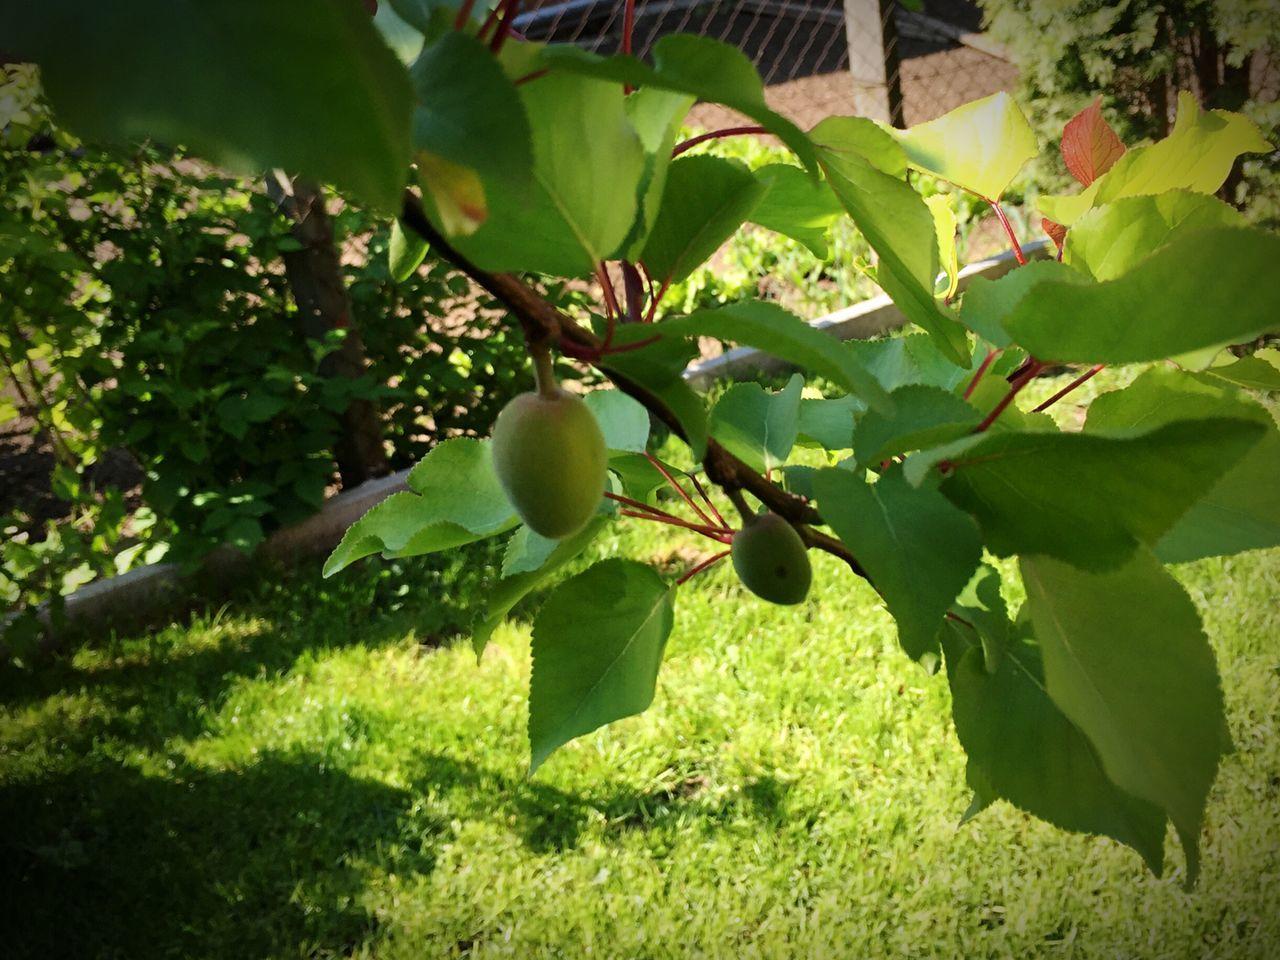 Garden Garden Photography Garden Fruits Fruit Fruit Tree Apricot Tree First Fruit Apricots